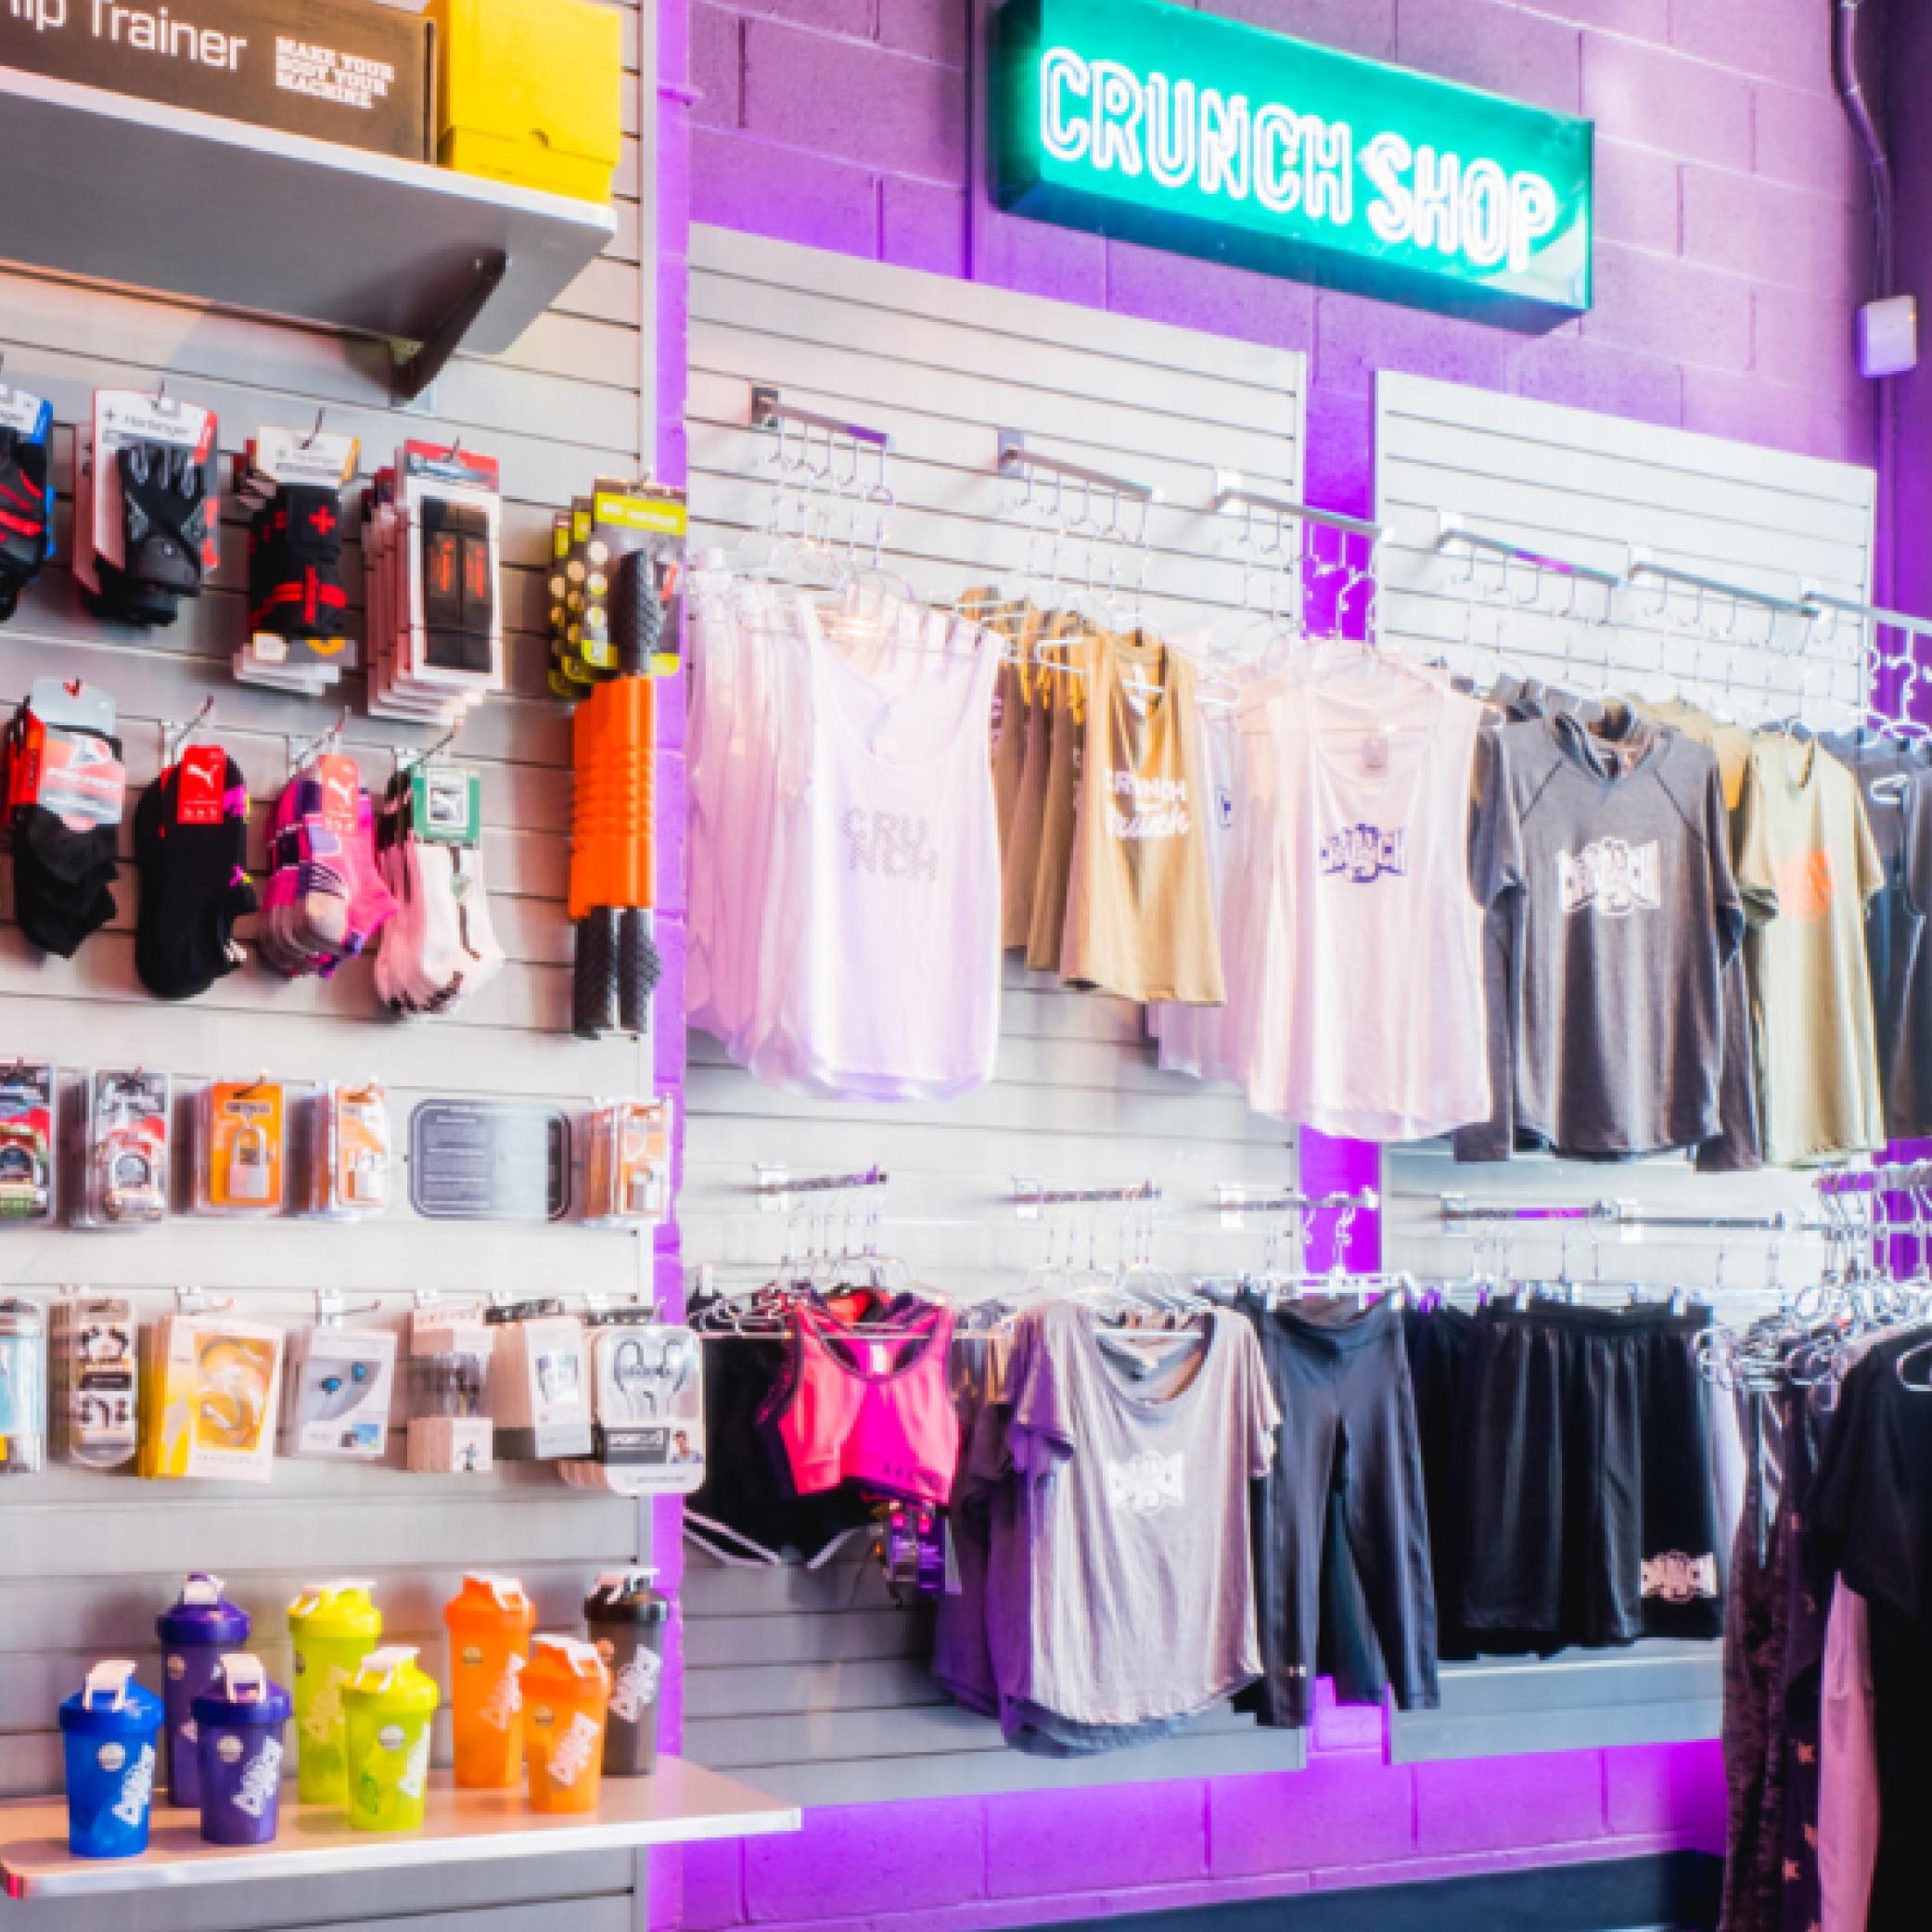 Crunch Shop